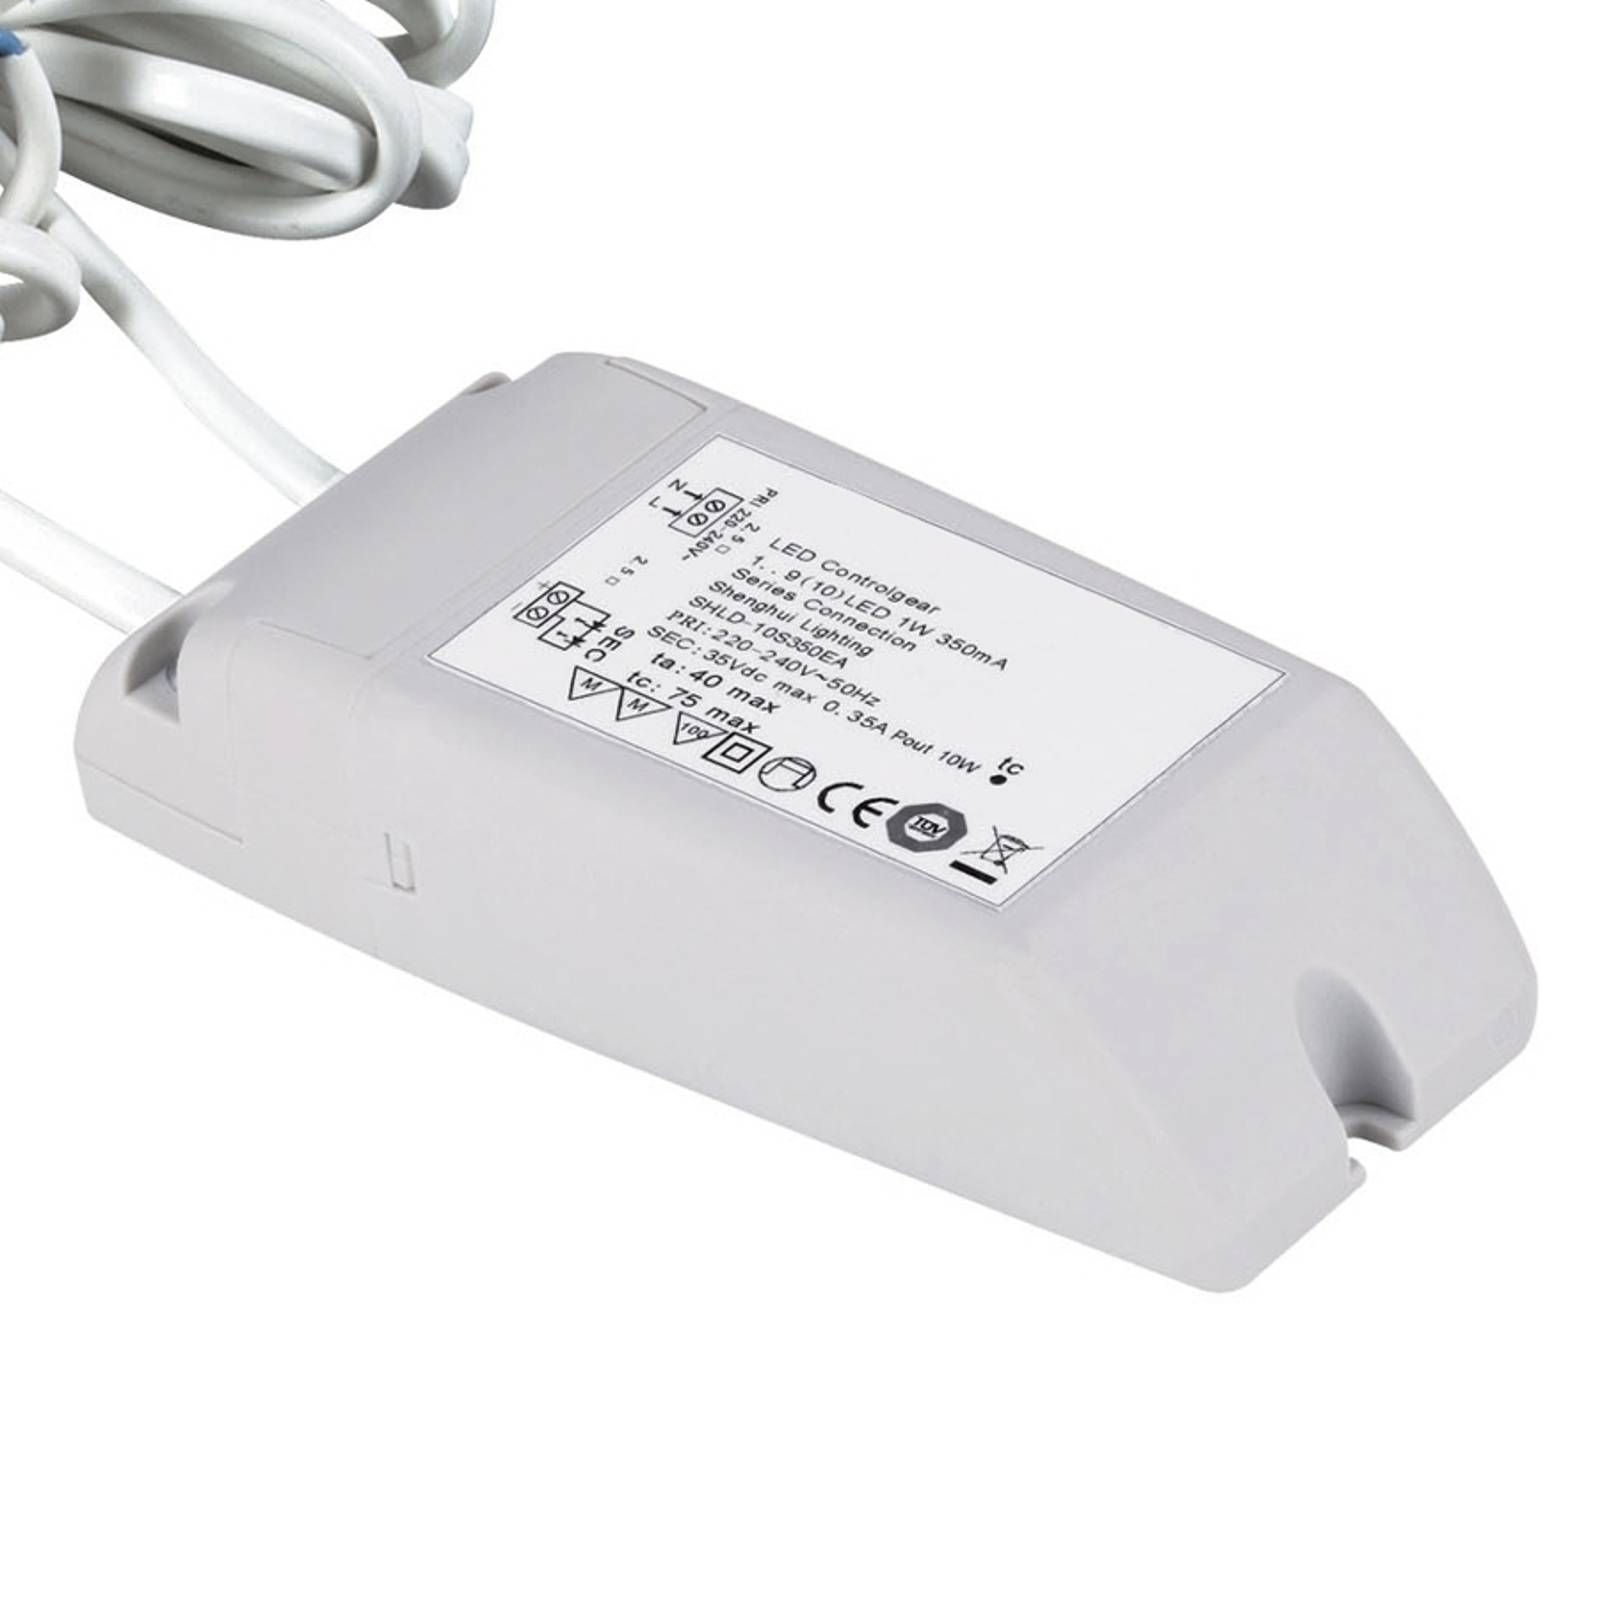 LED-muuntaja-virtalähde 10 W